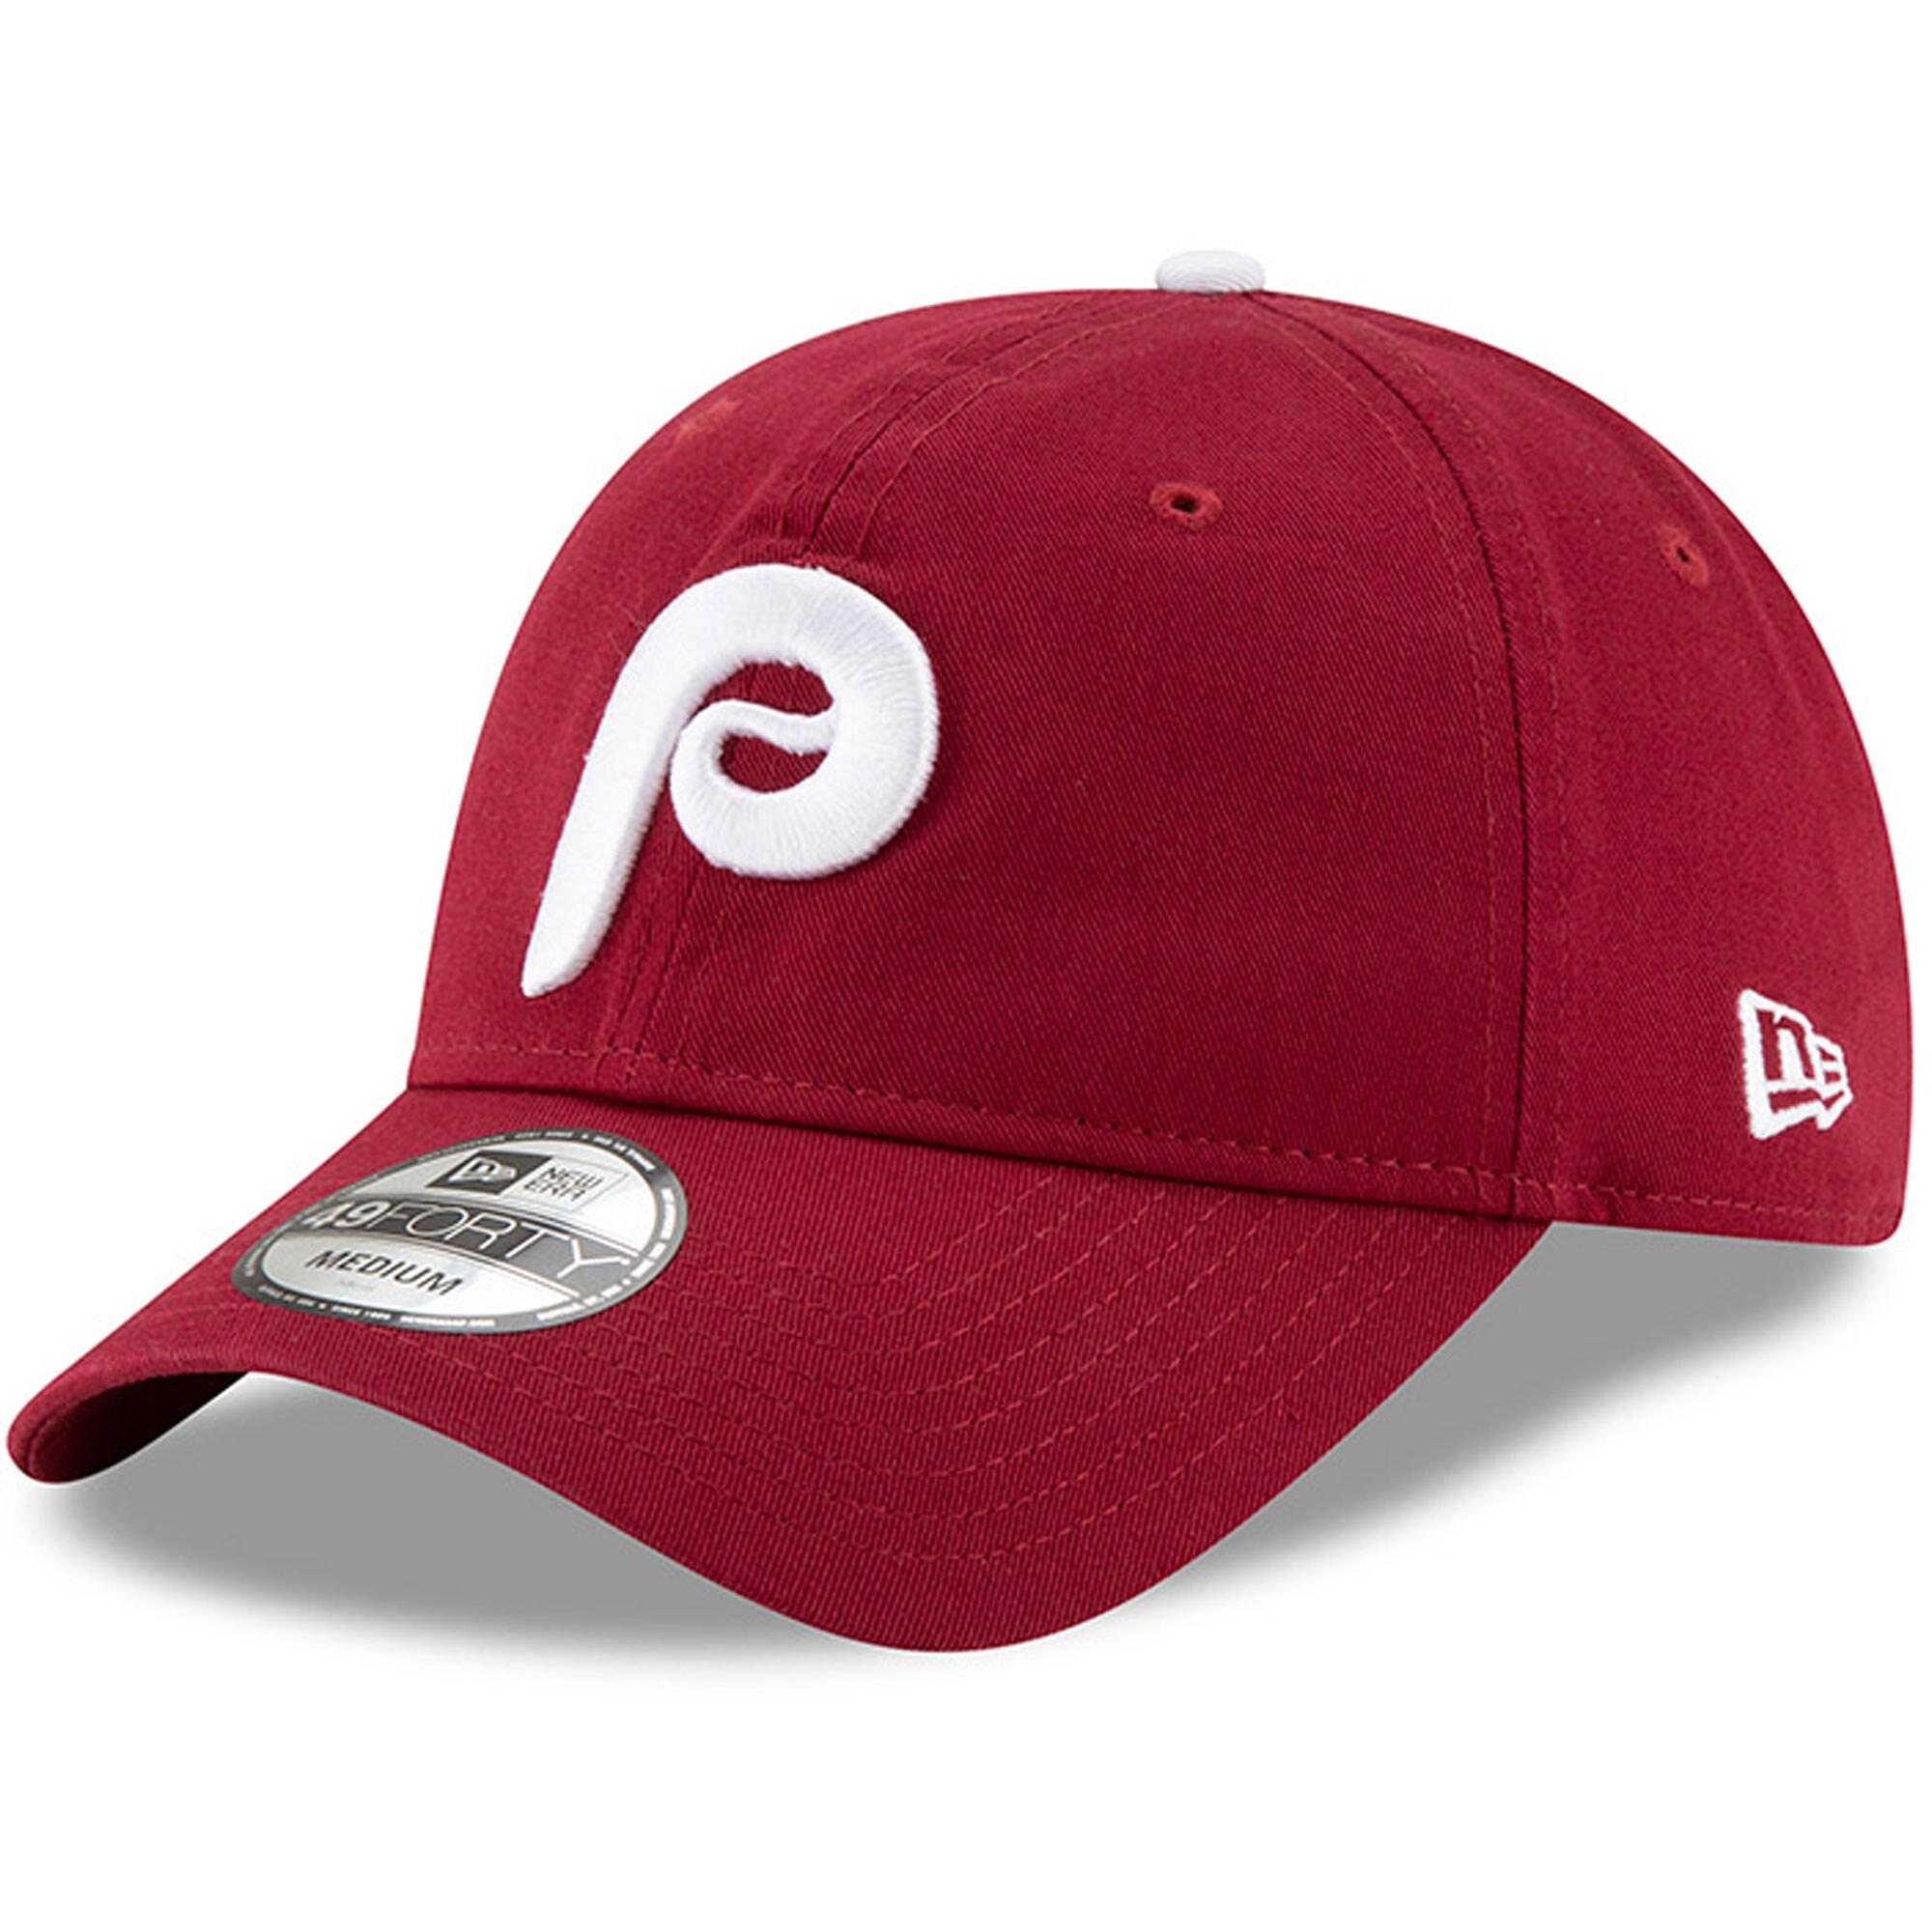 Philadelphia Phillies New Era Alternate 2 Core Replica 49FORTY Fitted Hat - Burgundy